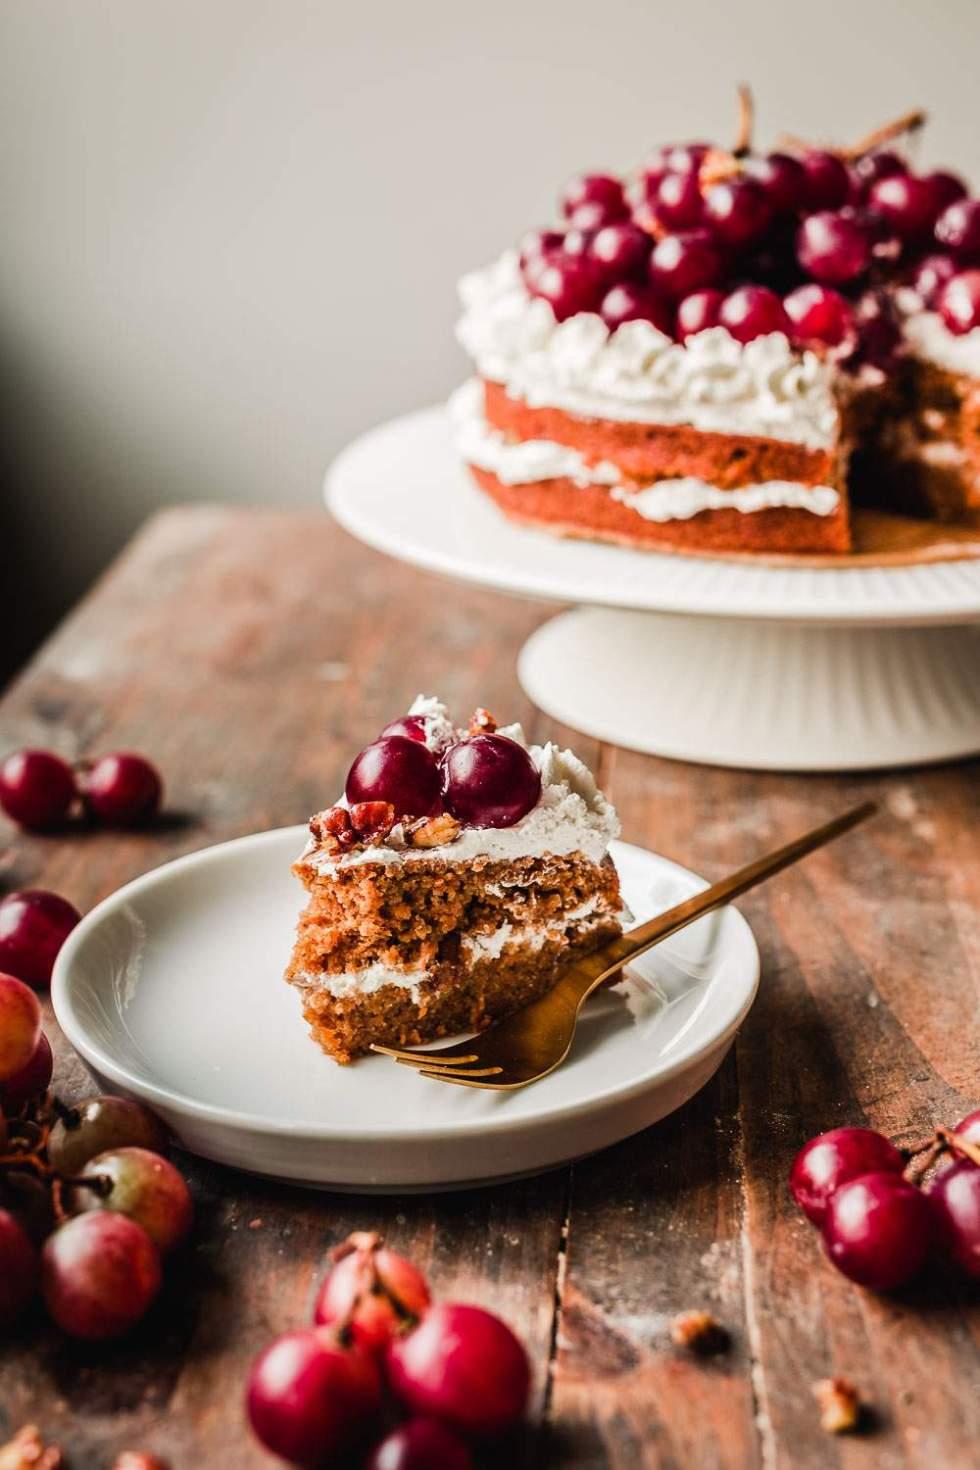 Gluten-free vegan carrot cake with pecans